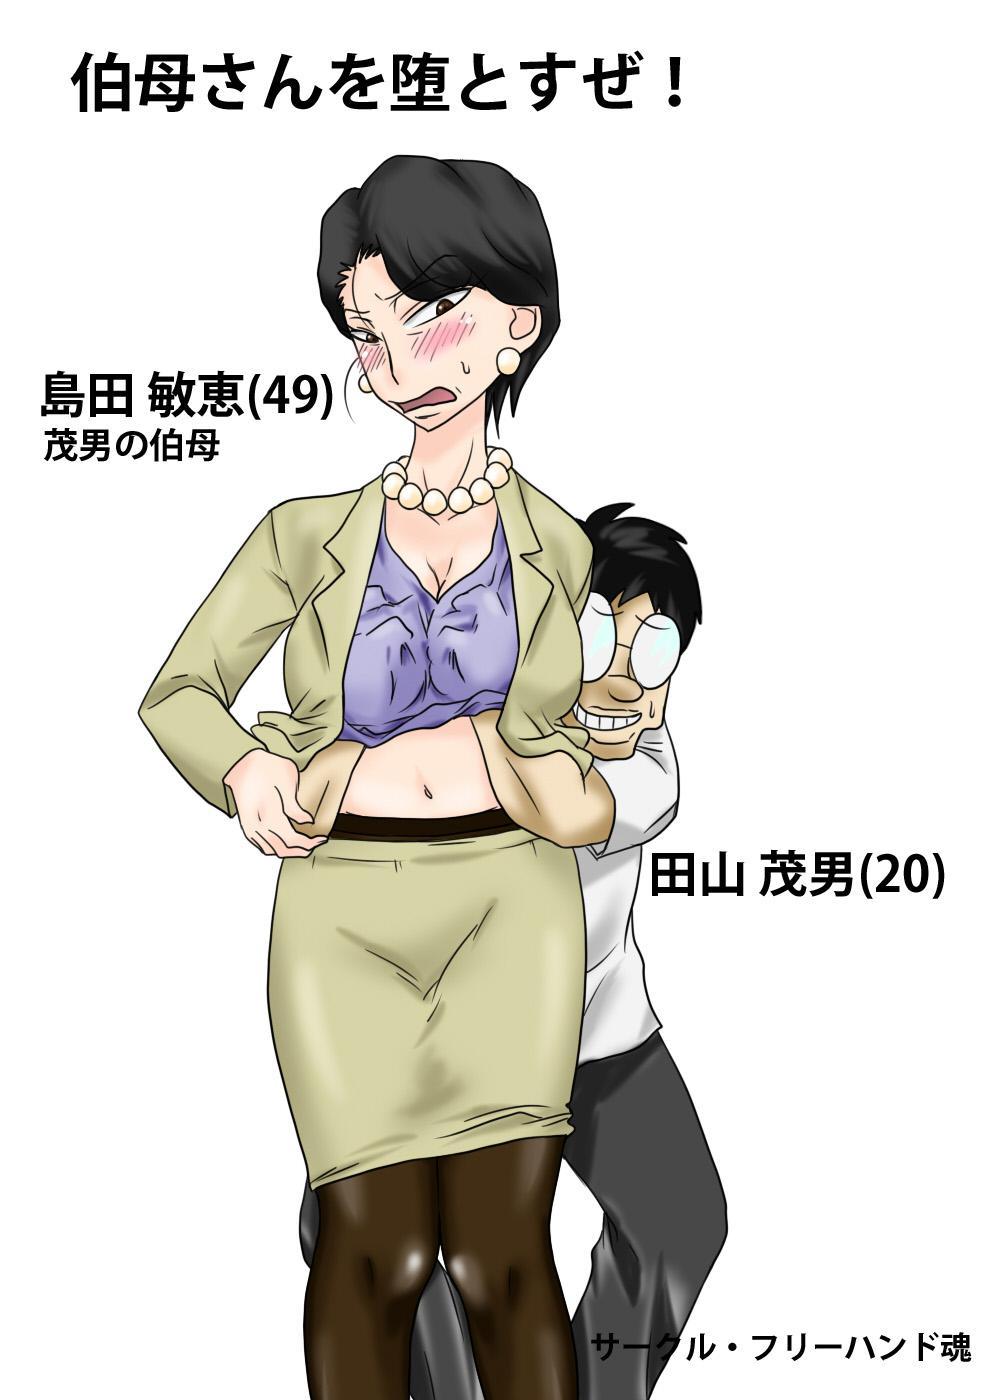 Oba-san o Otosuze! 0